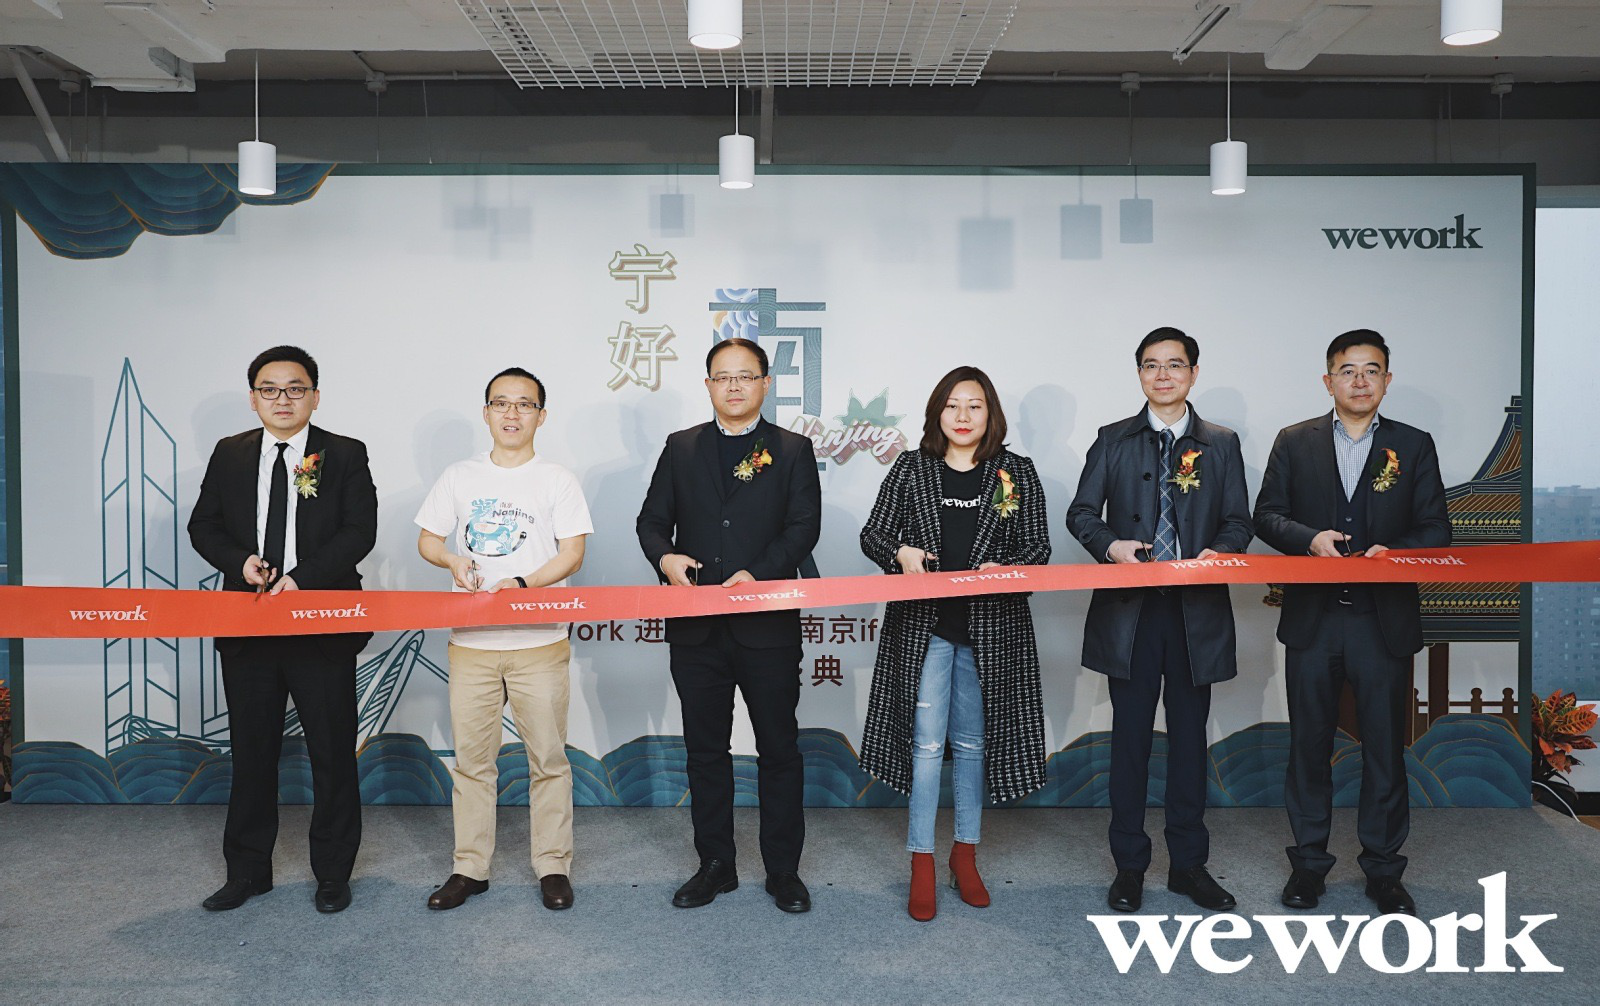 WeWork正式进驻南京在南京国金中心举办隆重揭幕仪式